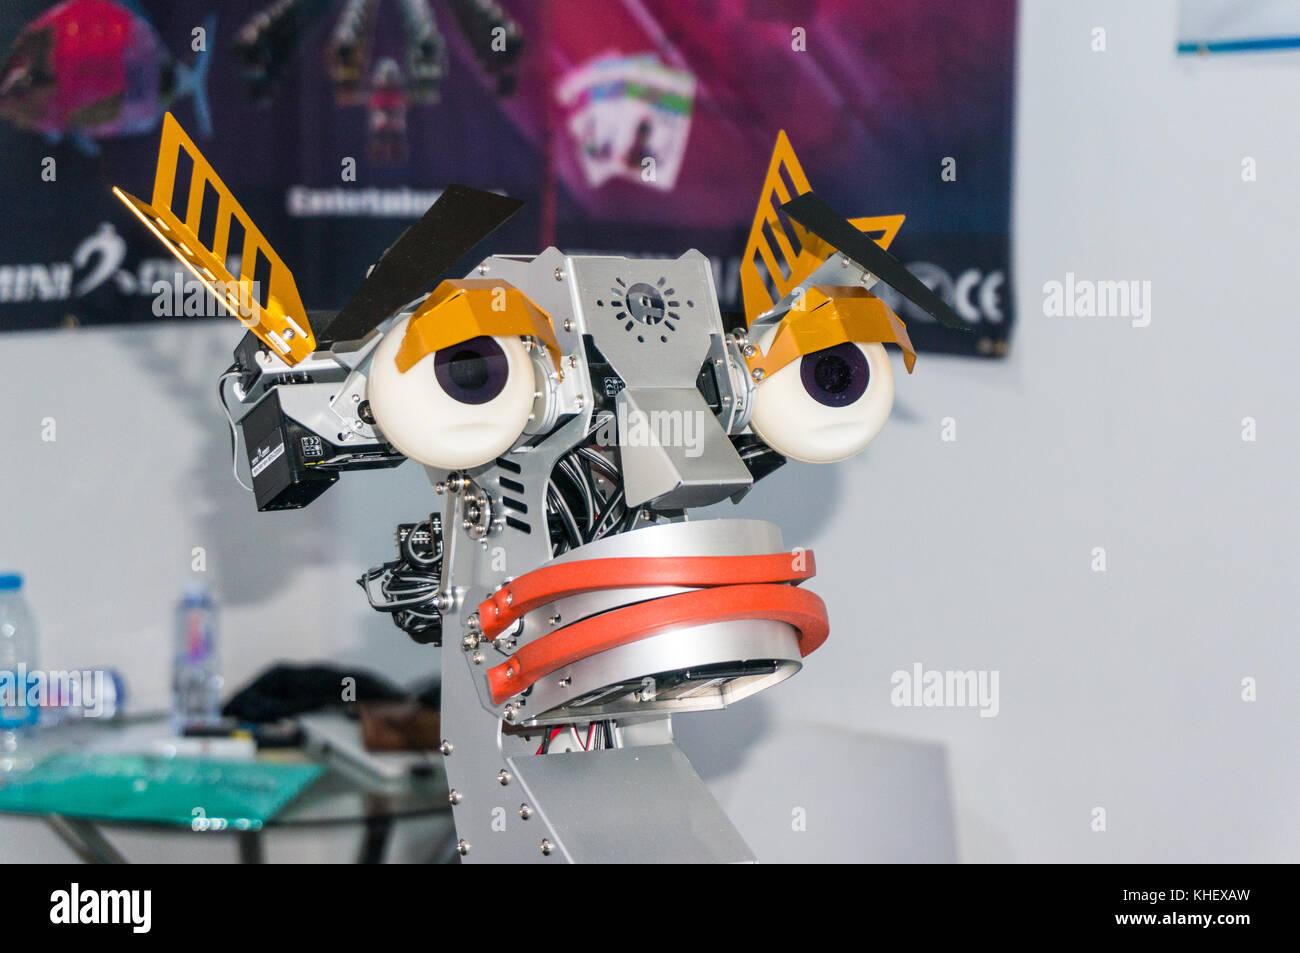 Funny Korean robot minirobot face facial expressions at China hi-tech fair in Shenzhen, known as 'Silicon Valley - Stock Image